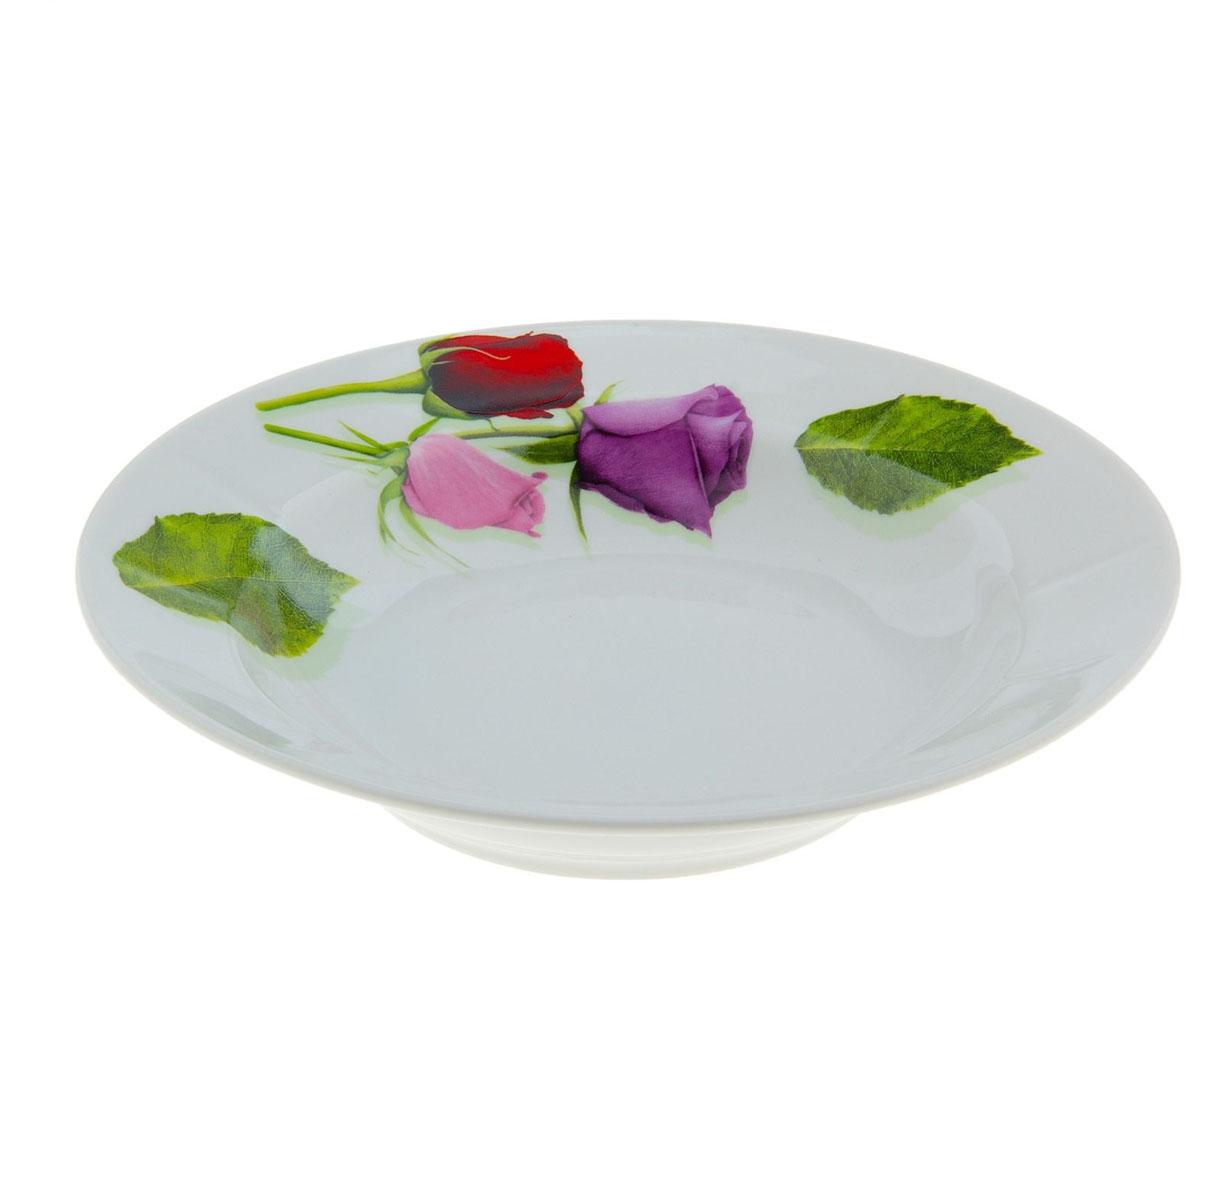 Тарелка глубокая Идиллия. Королева цветов, диаметр 20 см тарелка мелкая идиллия ромашка диаметр 20 см 5с0189